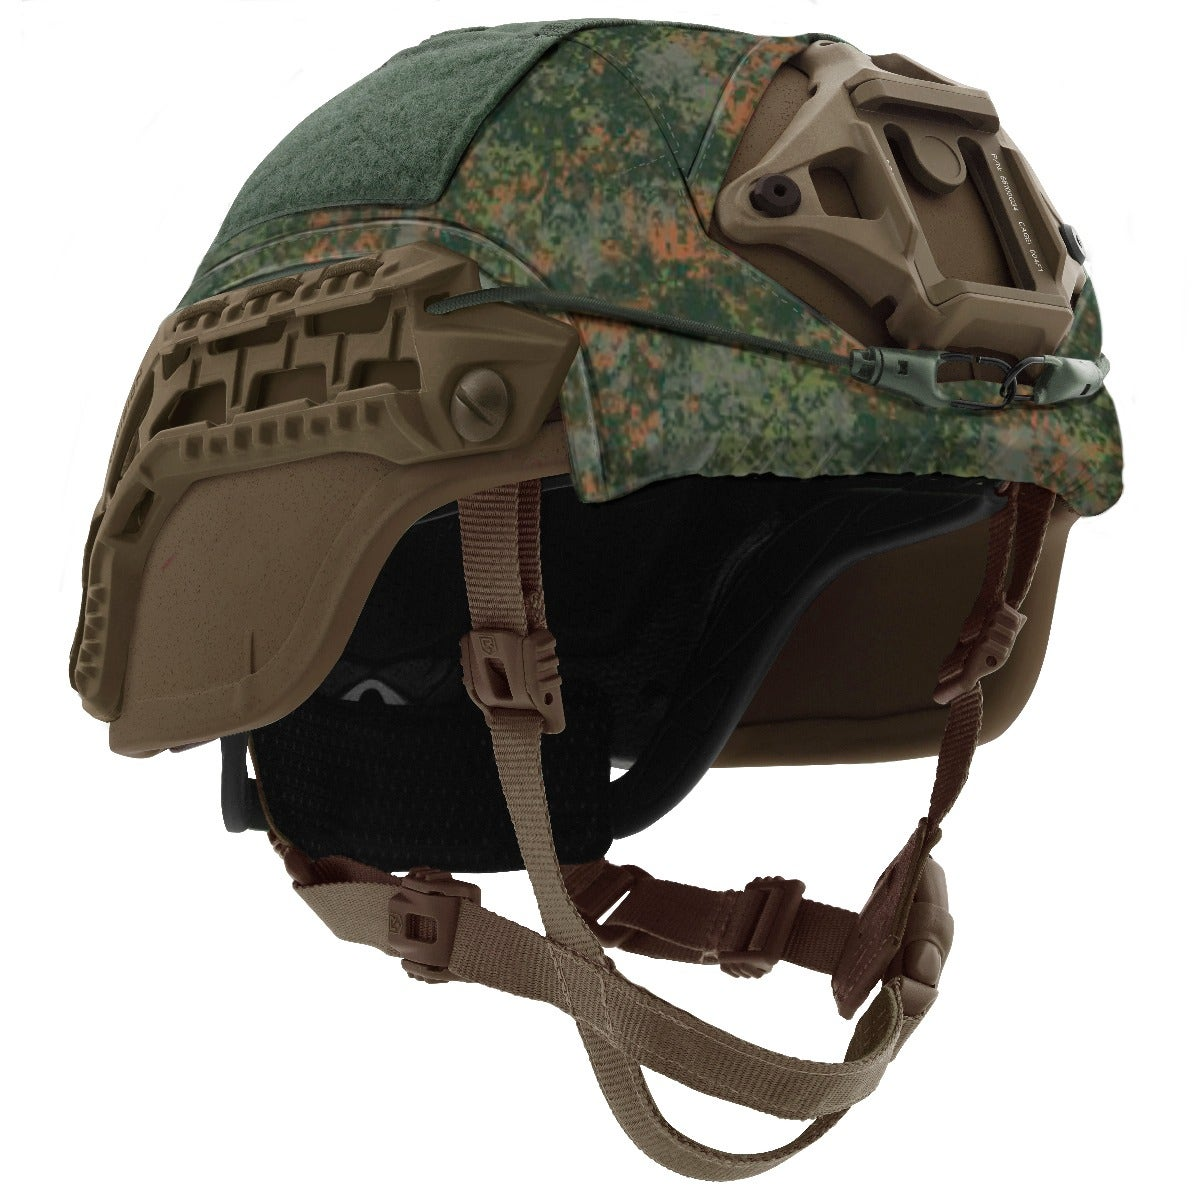 Revision Dutch Helmet